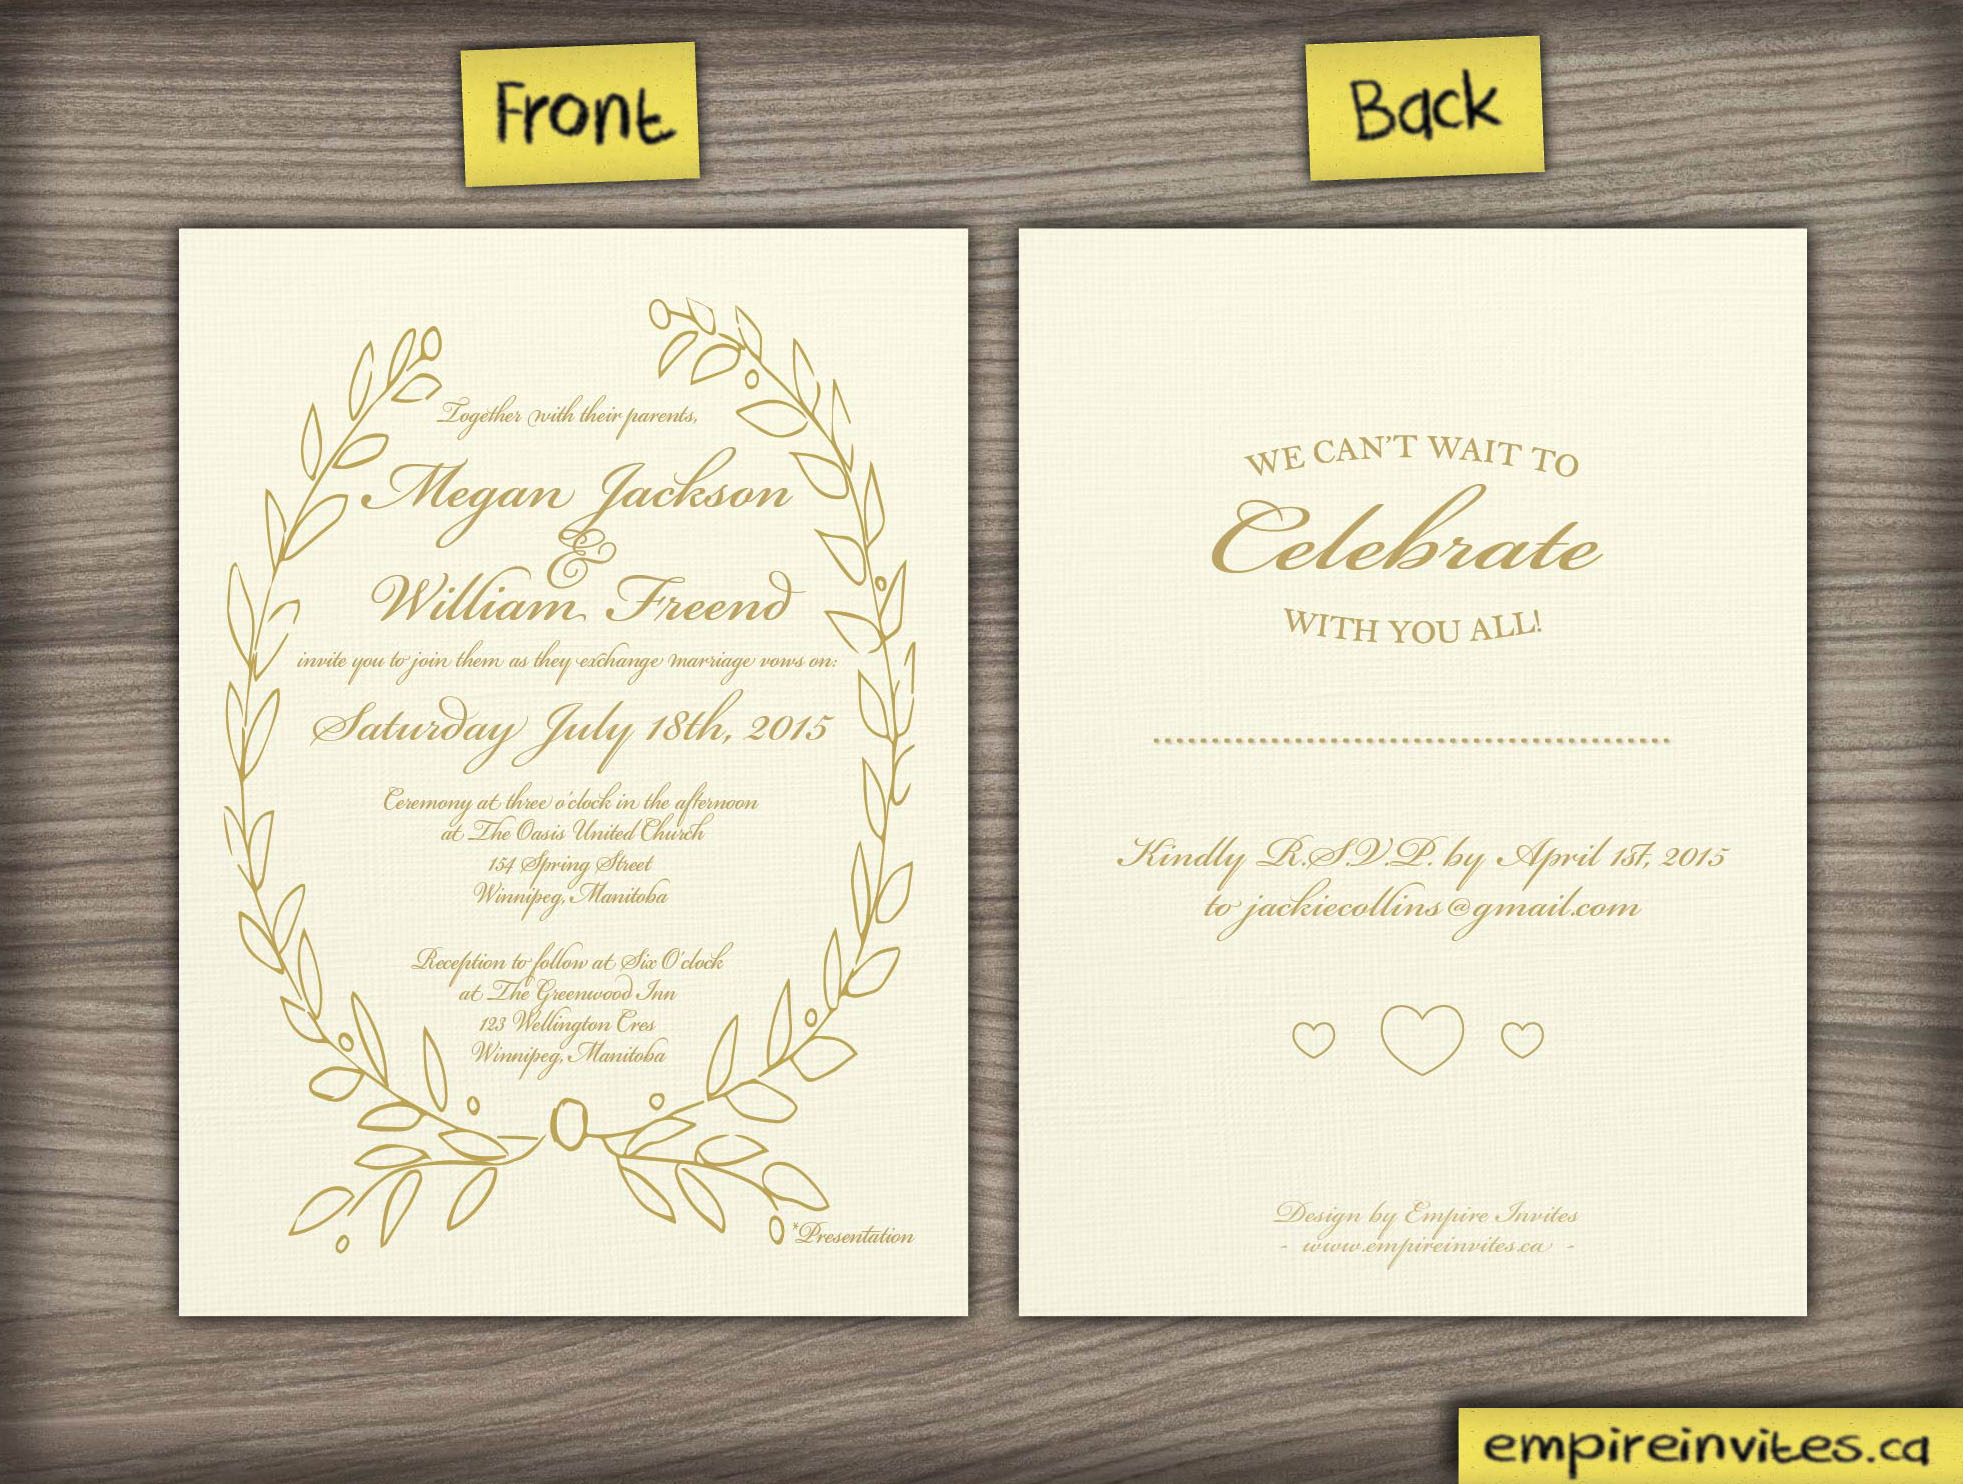 Wedding Invitation Envelopes Canada: Custom Greek Style Wedding Invitation From Winnipeg